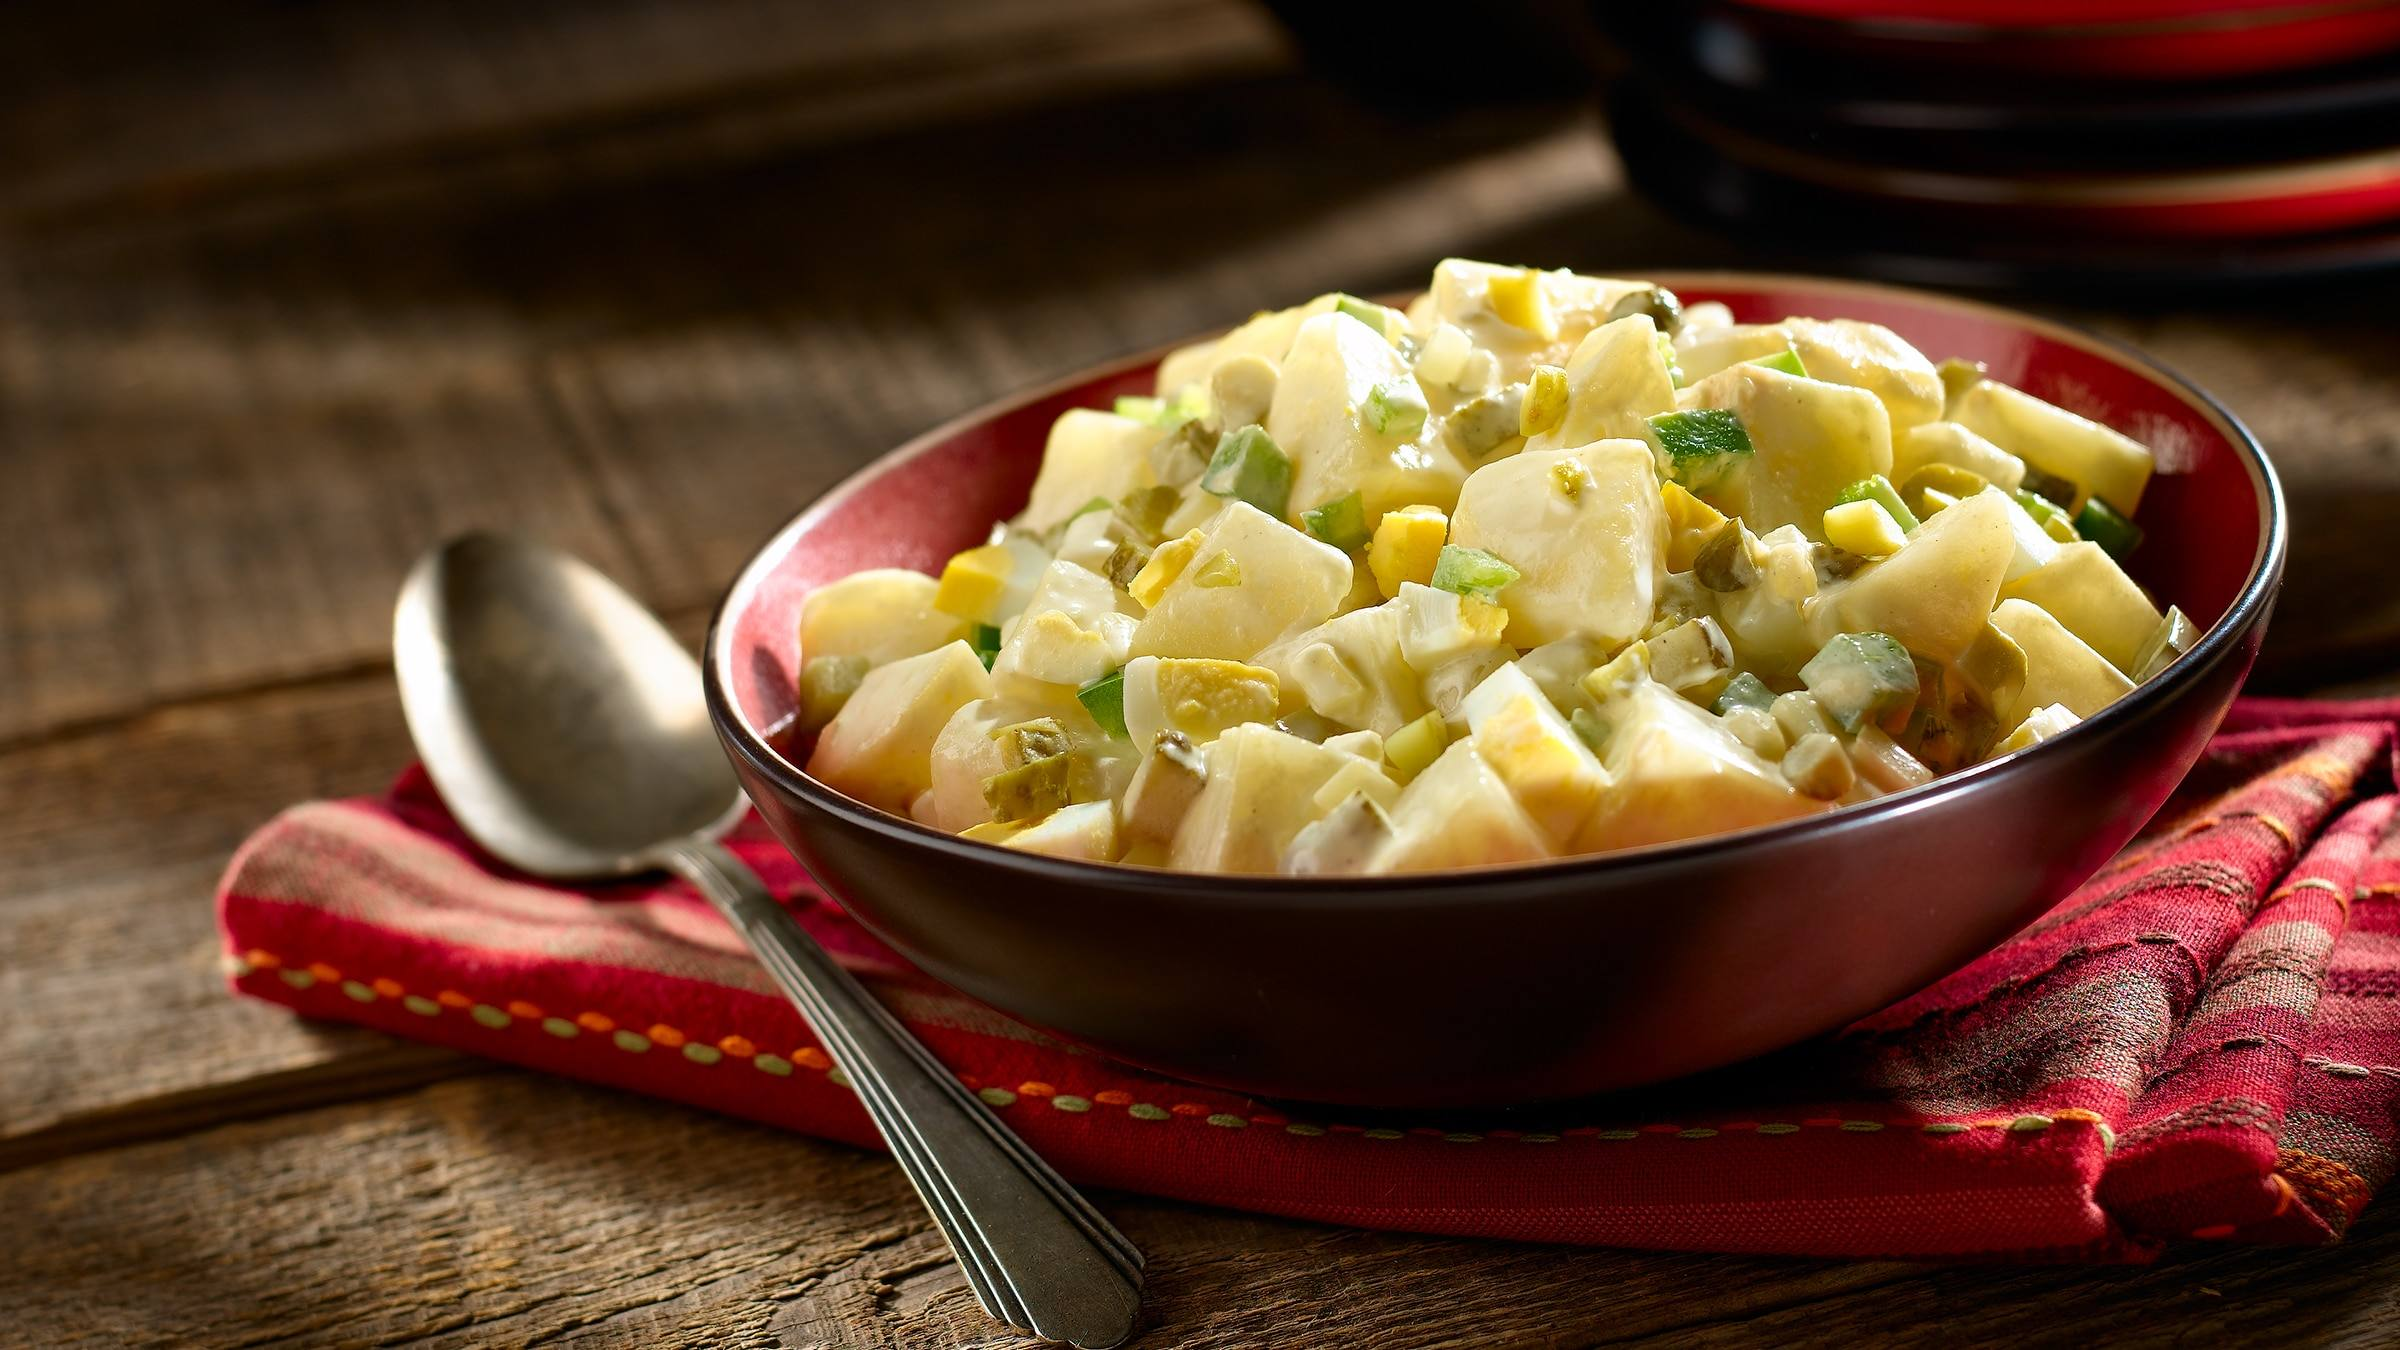 Martha's Hometown Favorite Potato Salad